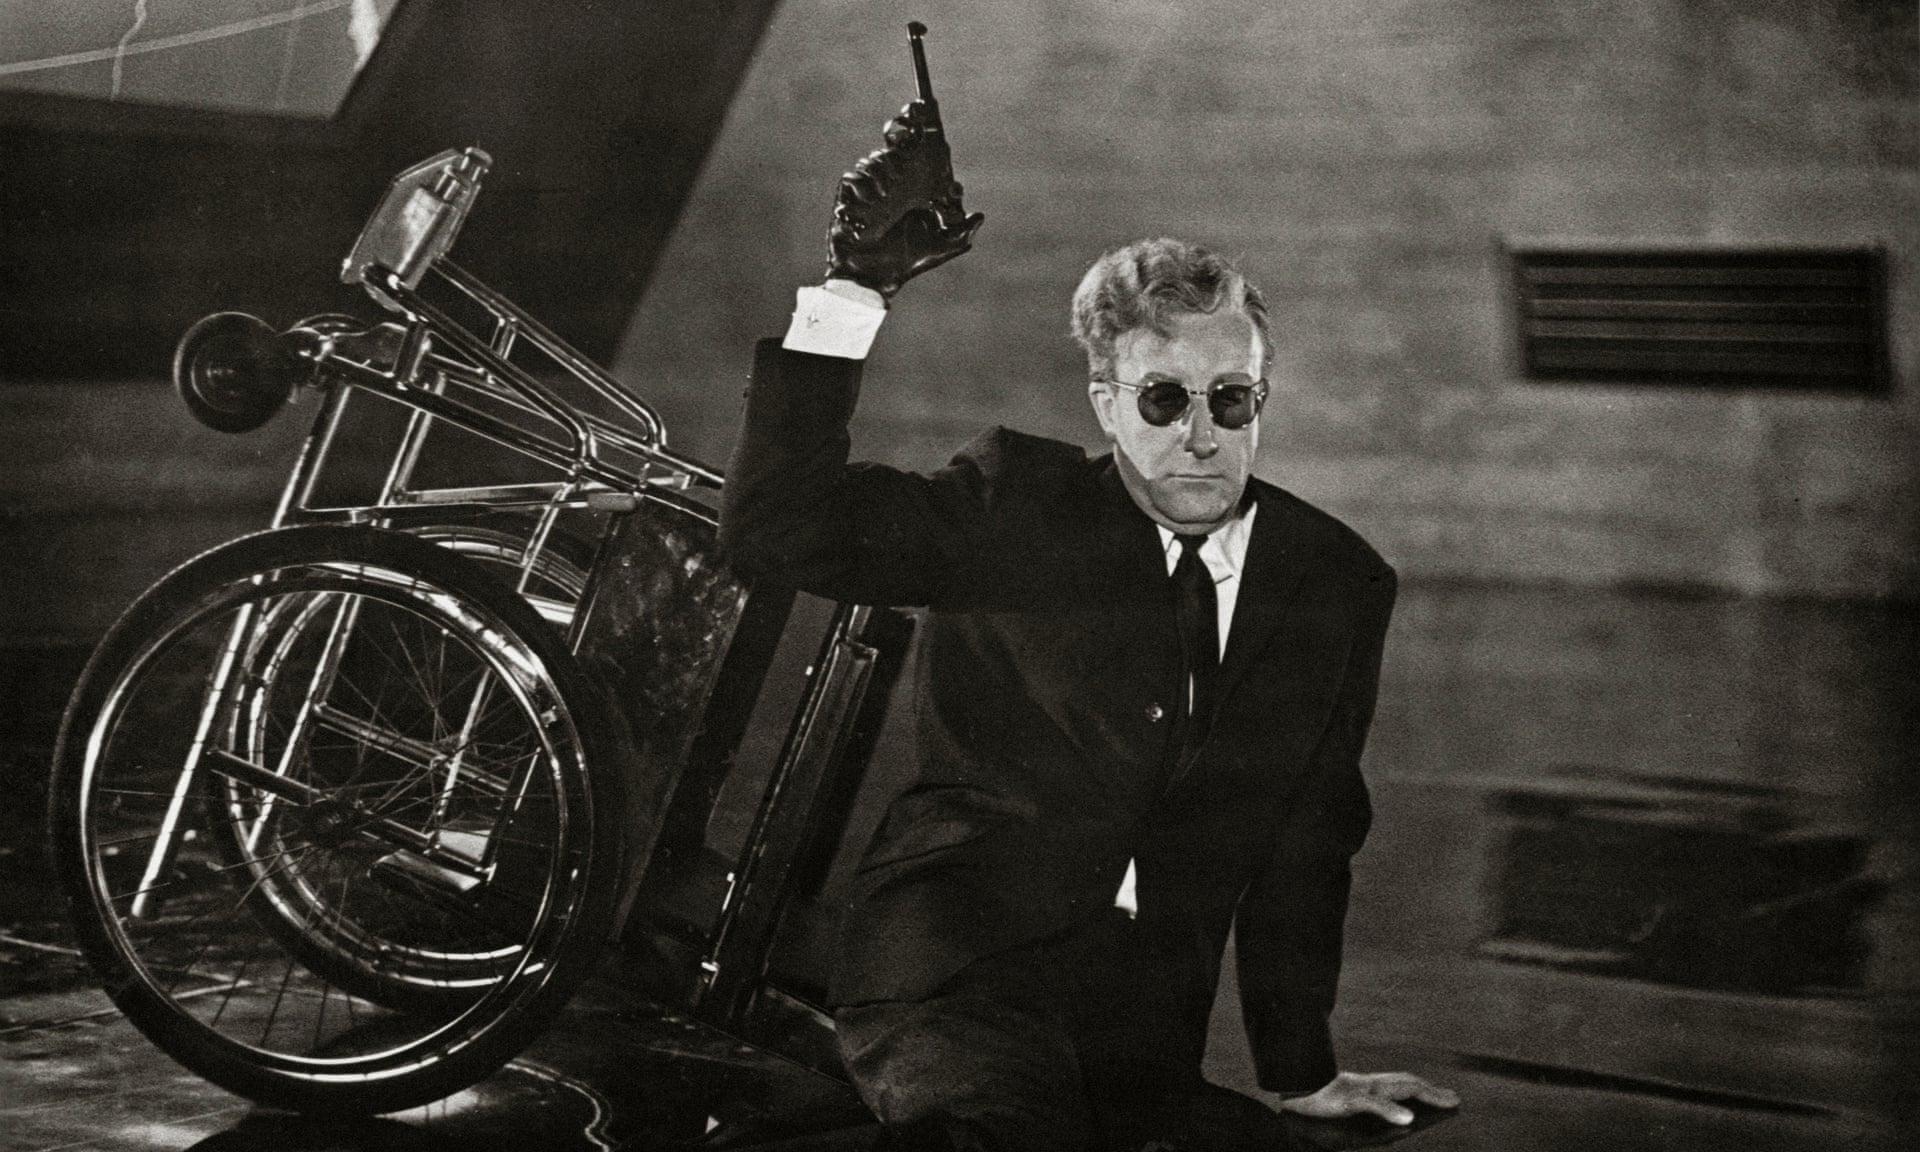 Dr. Strangelove filmi